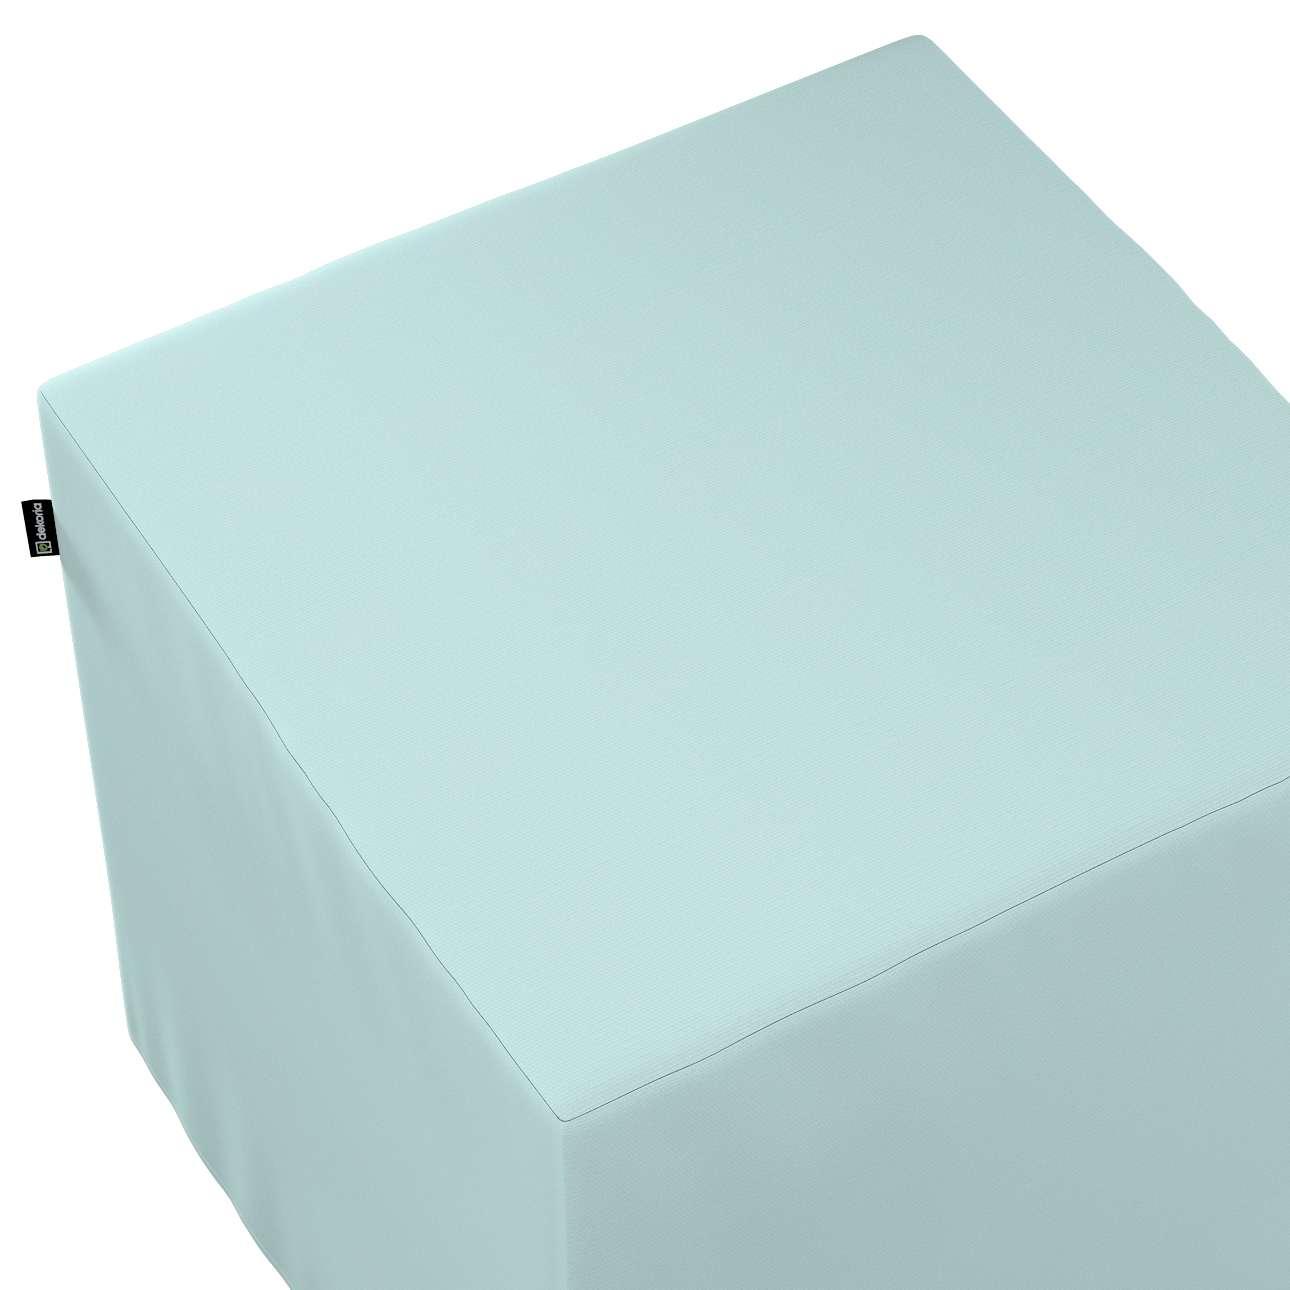 Pufa kostka w kolekcji Cotton Panama, tkanina: 702-10